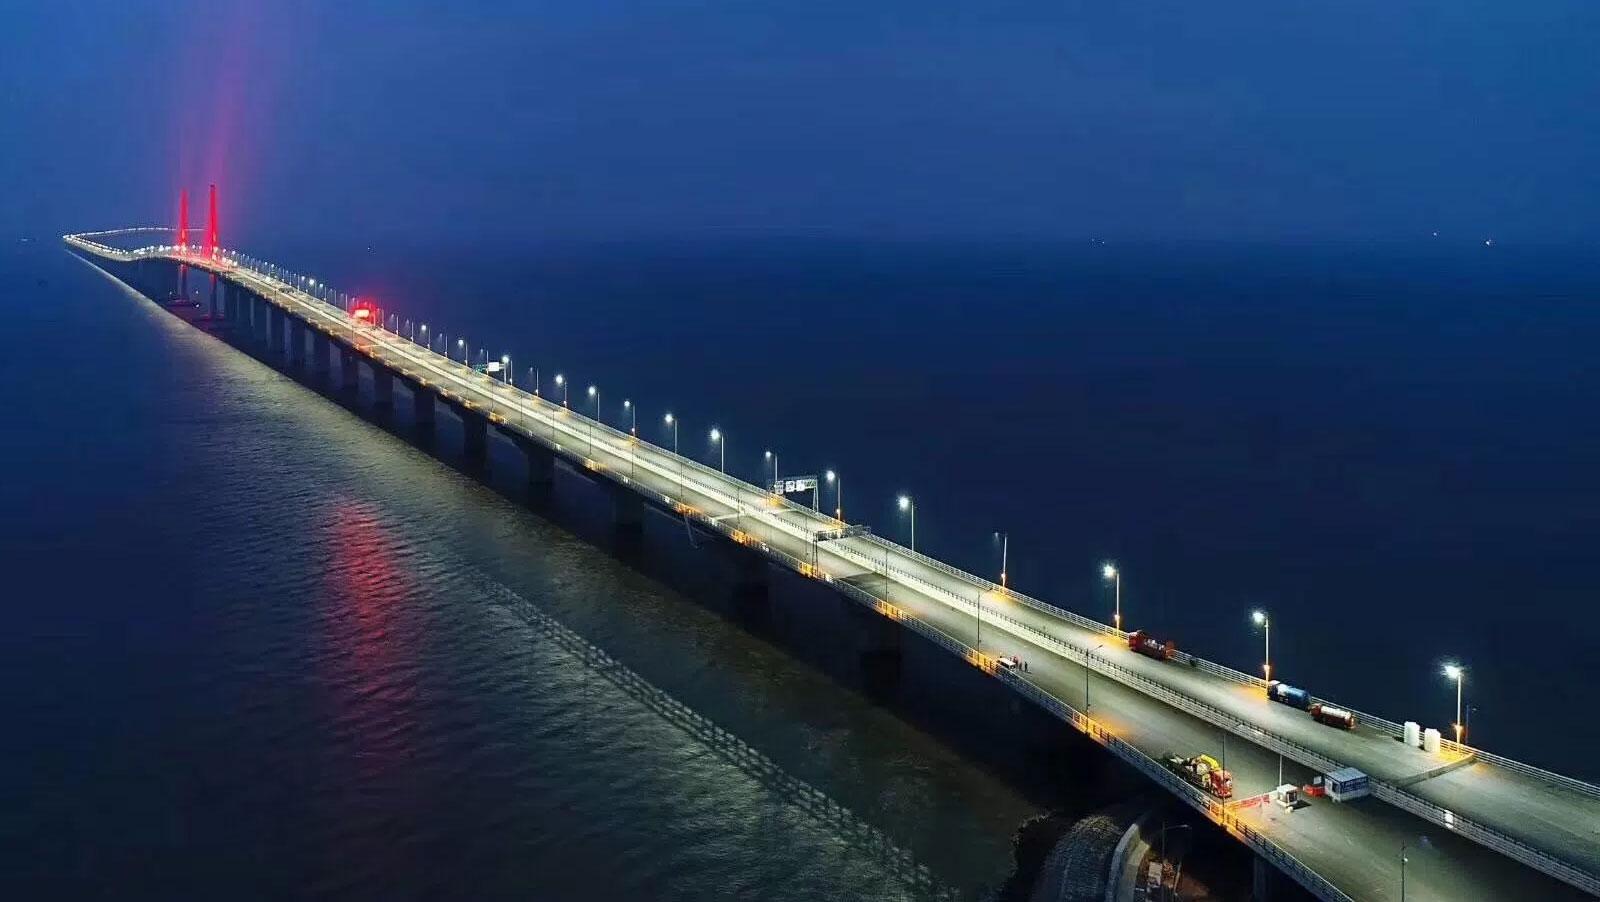 Hong Kong, Macau now joined by 'bridge of death'